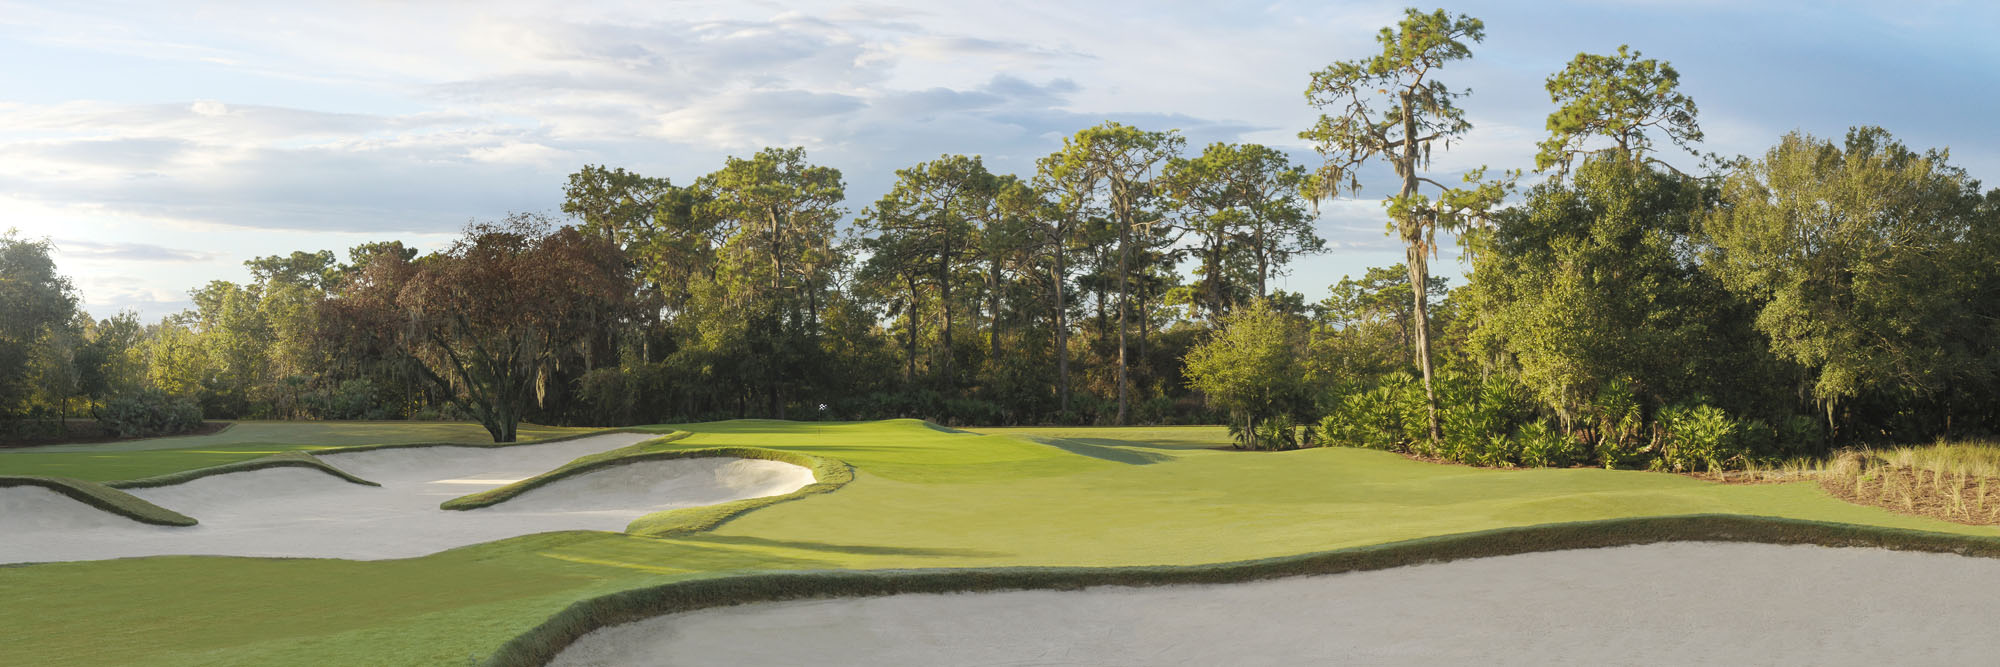 Golf Course Image - Old Memorial Golf Club No. 8